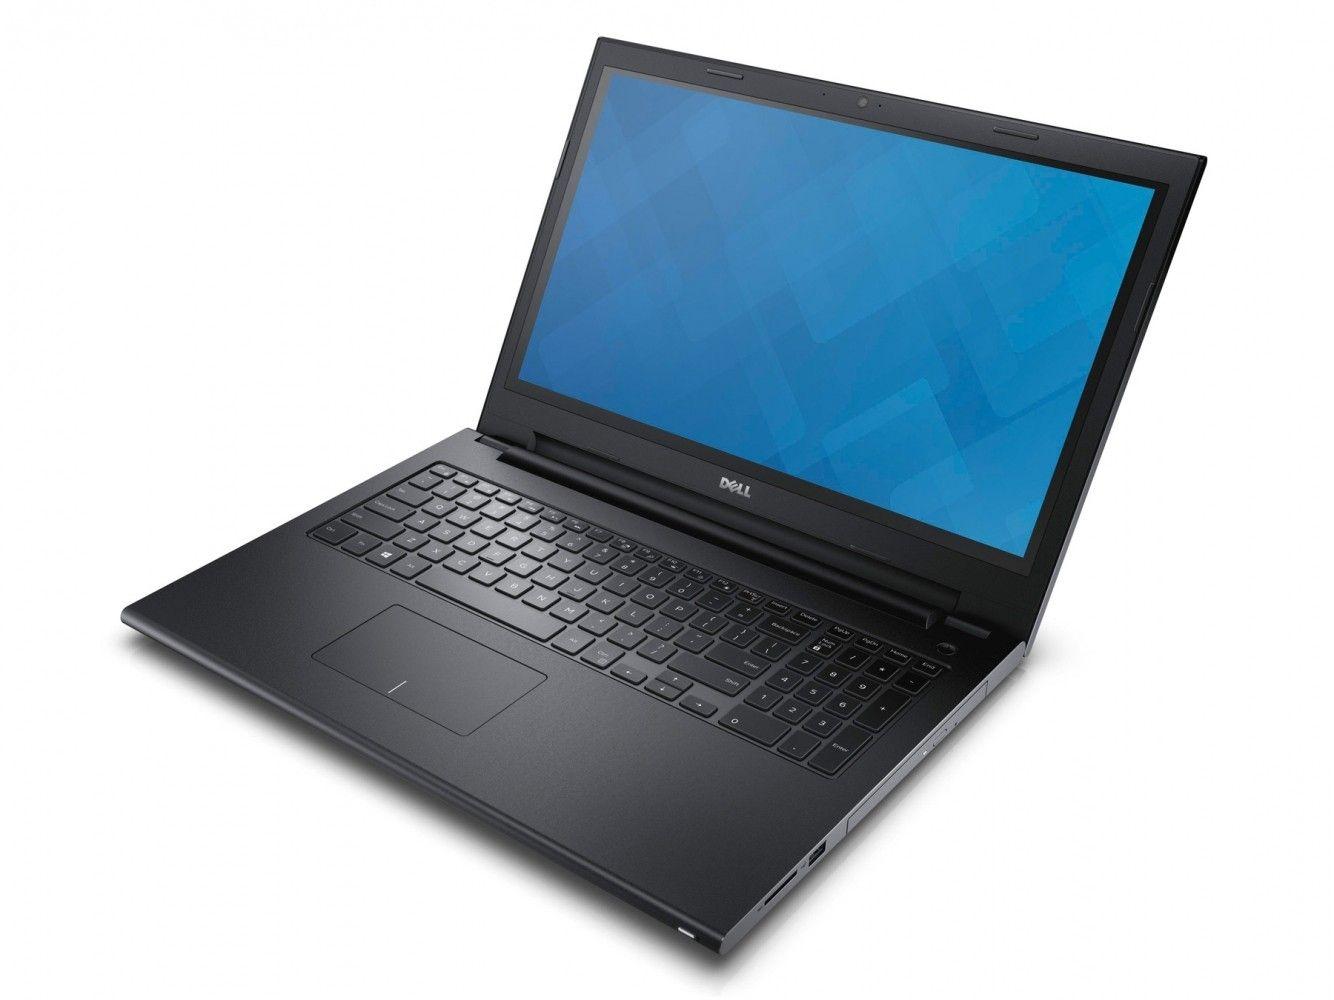 Ноутбук Dell Inspiron 3543 (I35545DDL-46) Black - 1